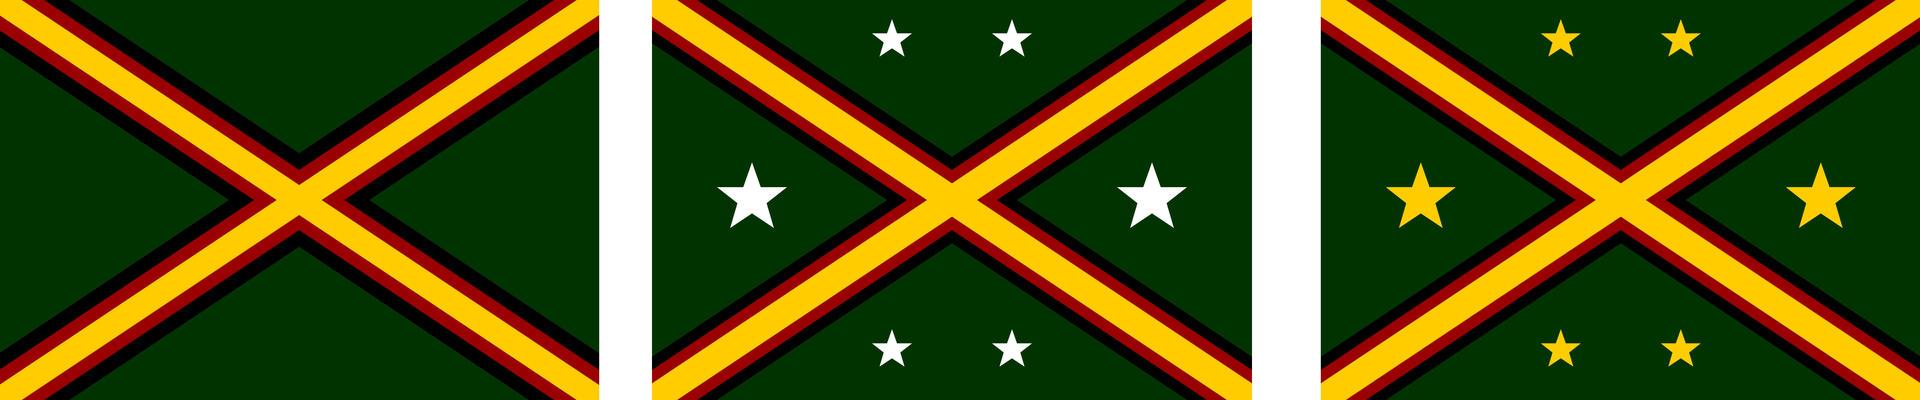 East African Federation Alternate Flag Designs